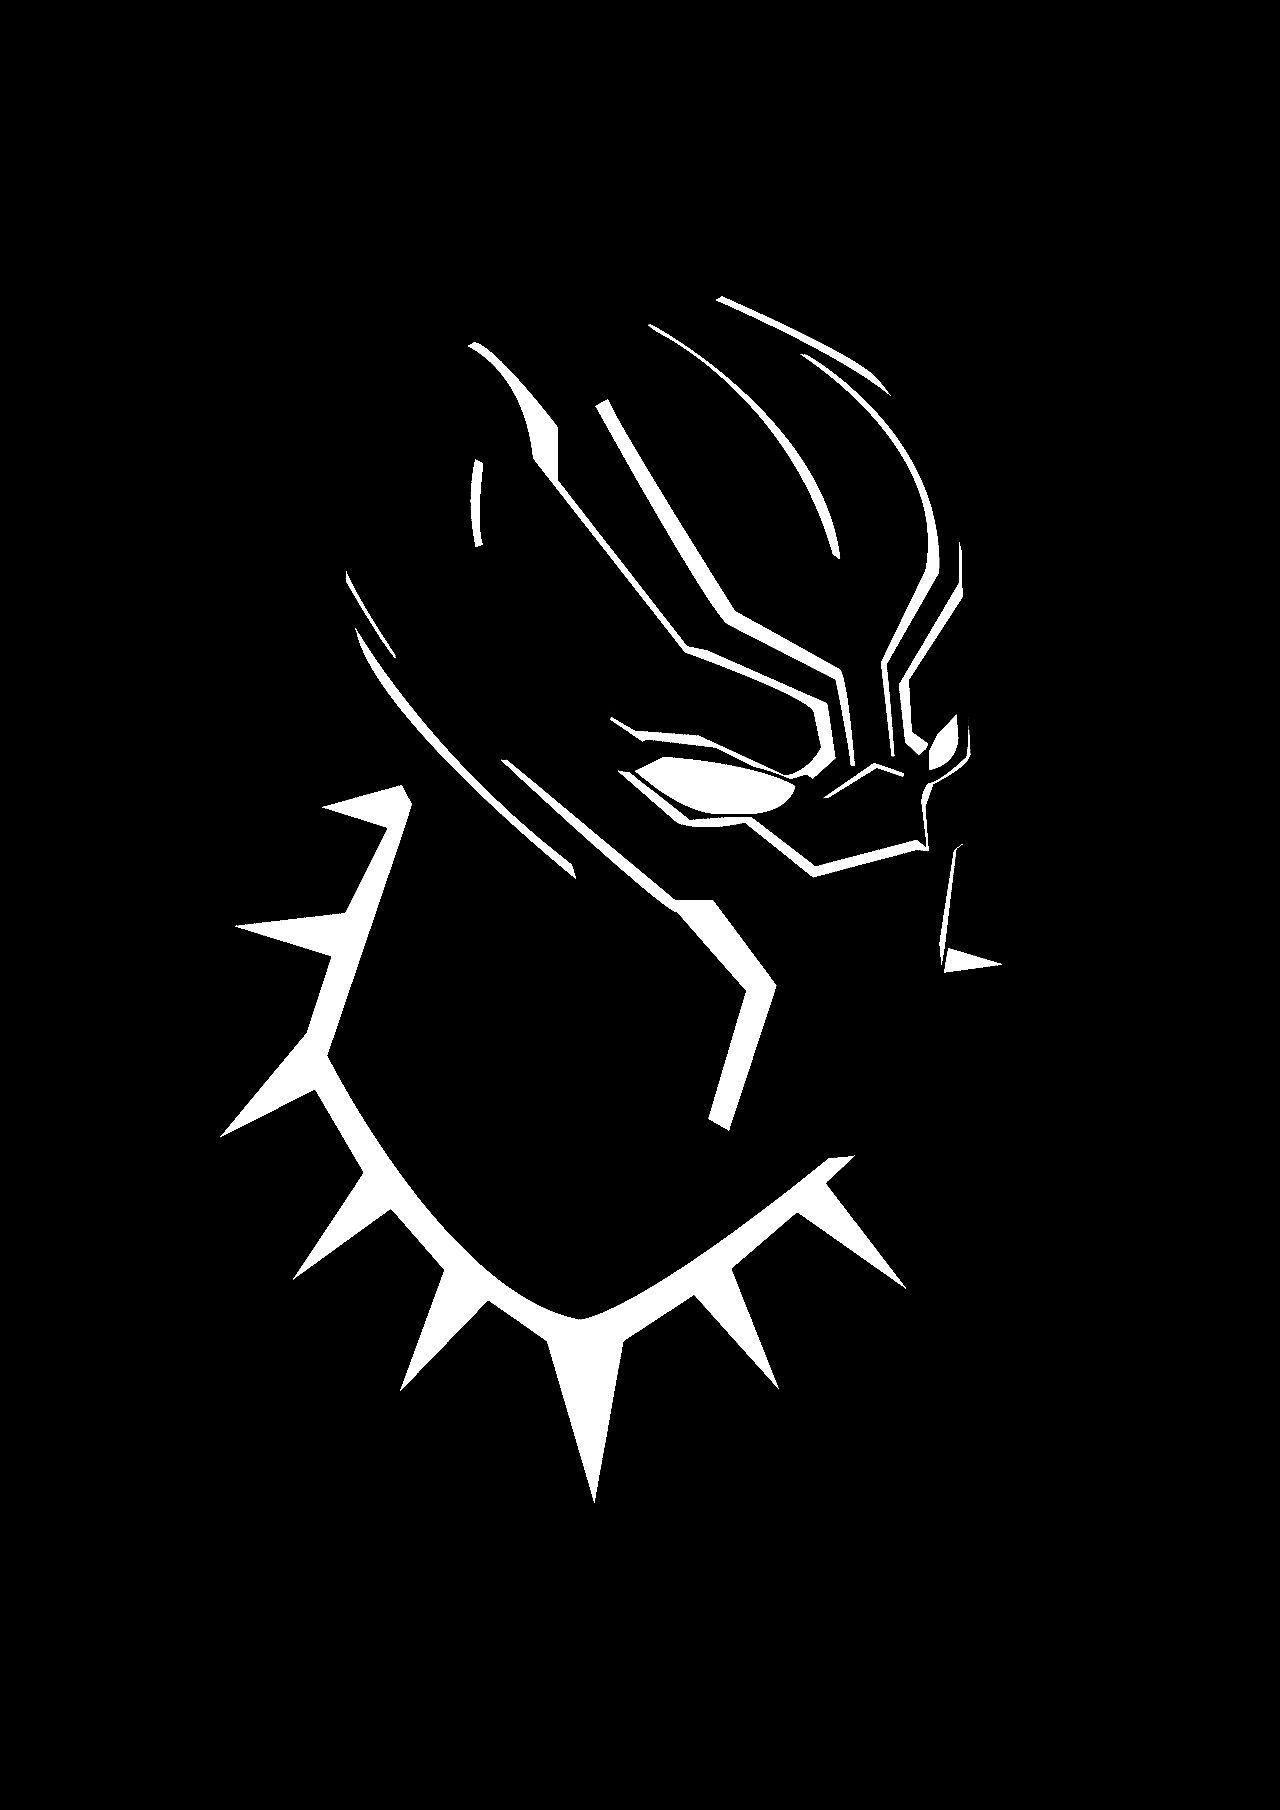 Mcu Black Panther Black White Art Black Panther Marvel Black Panther Hd Wallpaper Black Panther